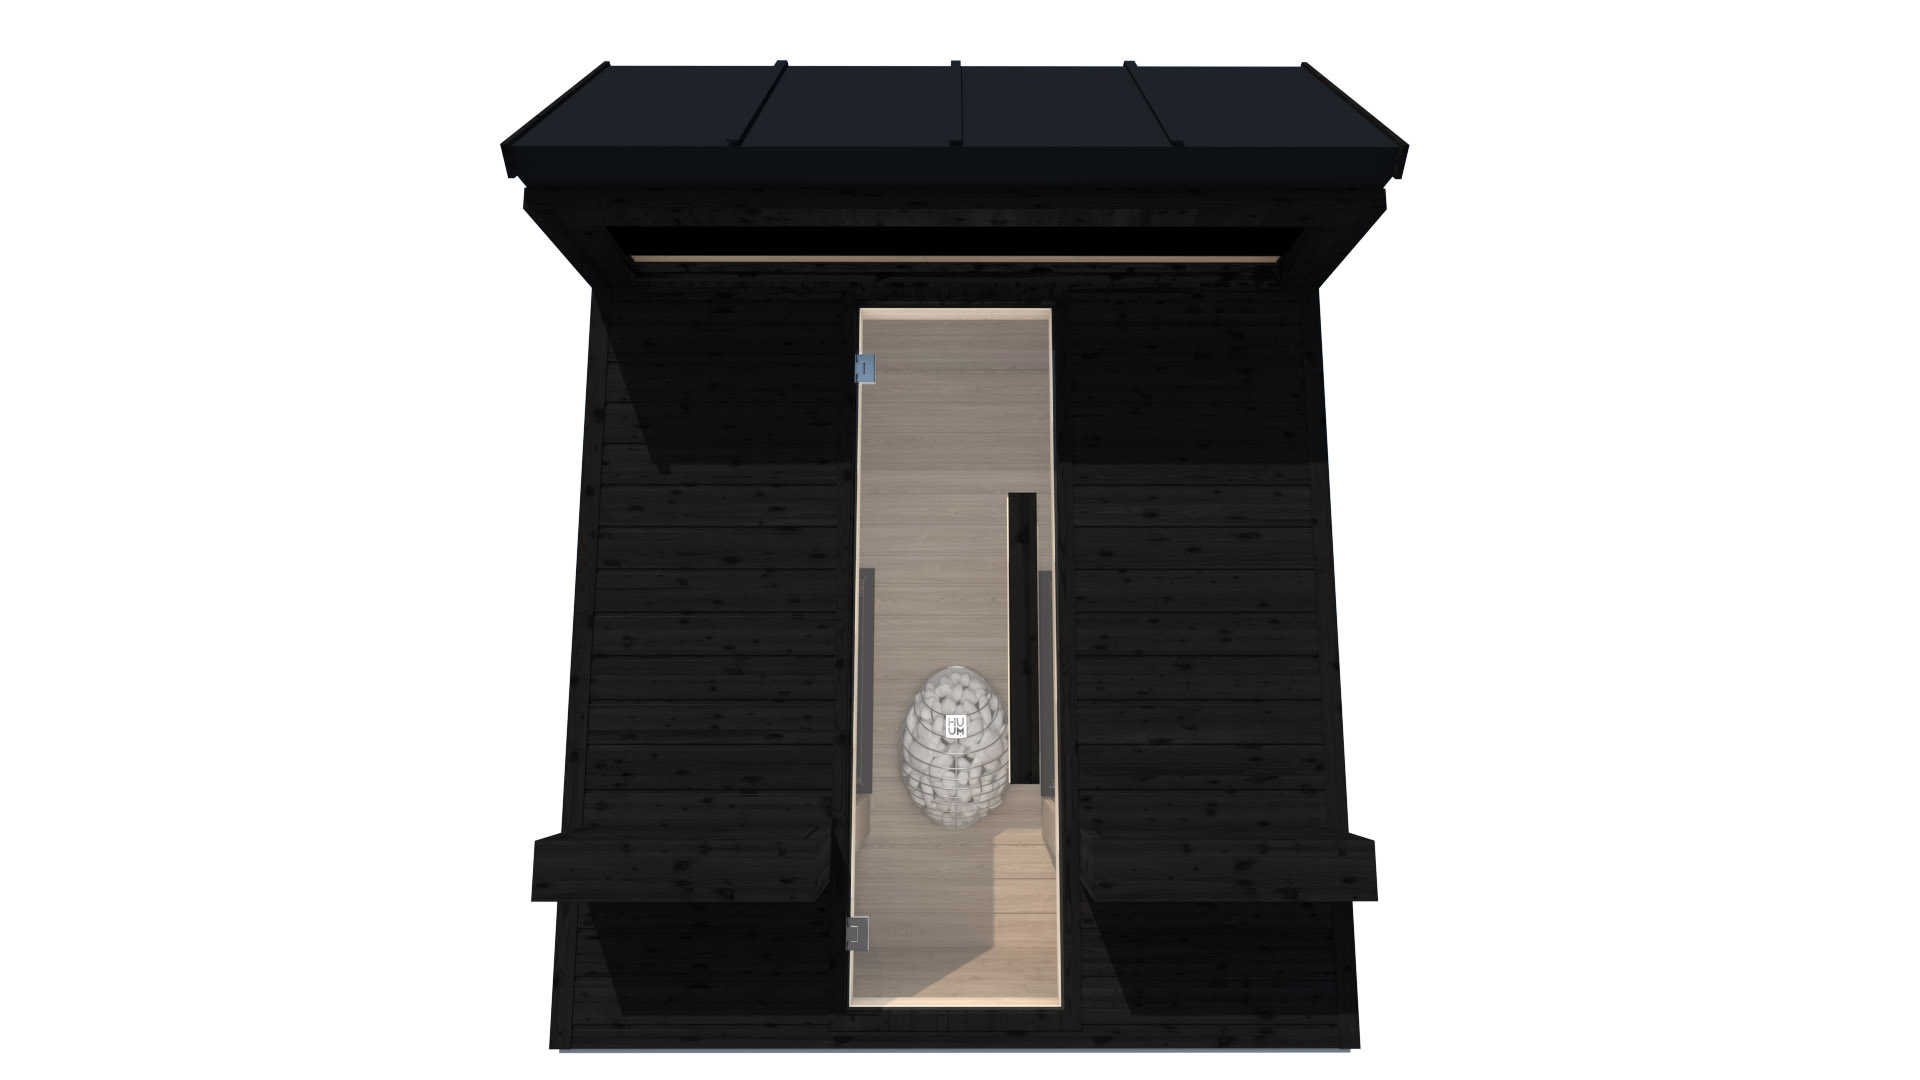 INUA Heimdall udendoers kombi sauna_infraroed sauna